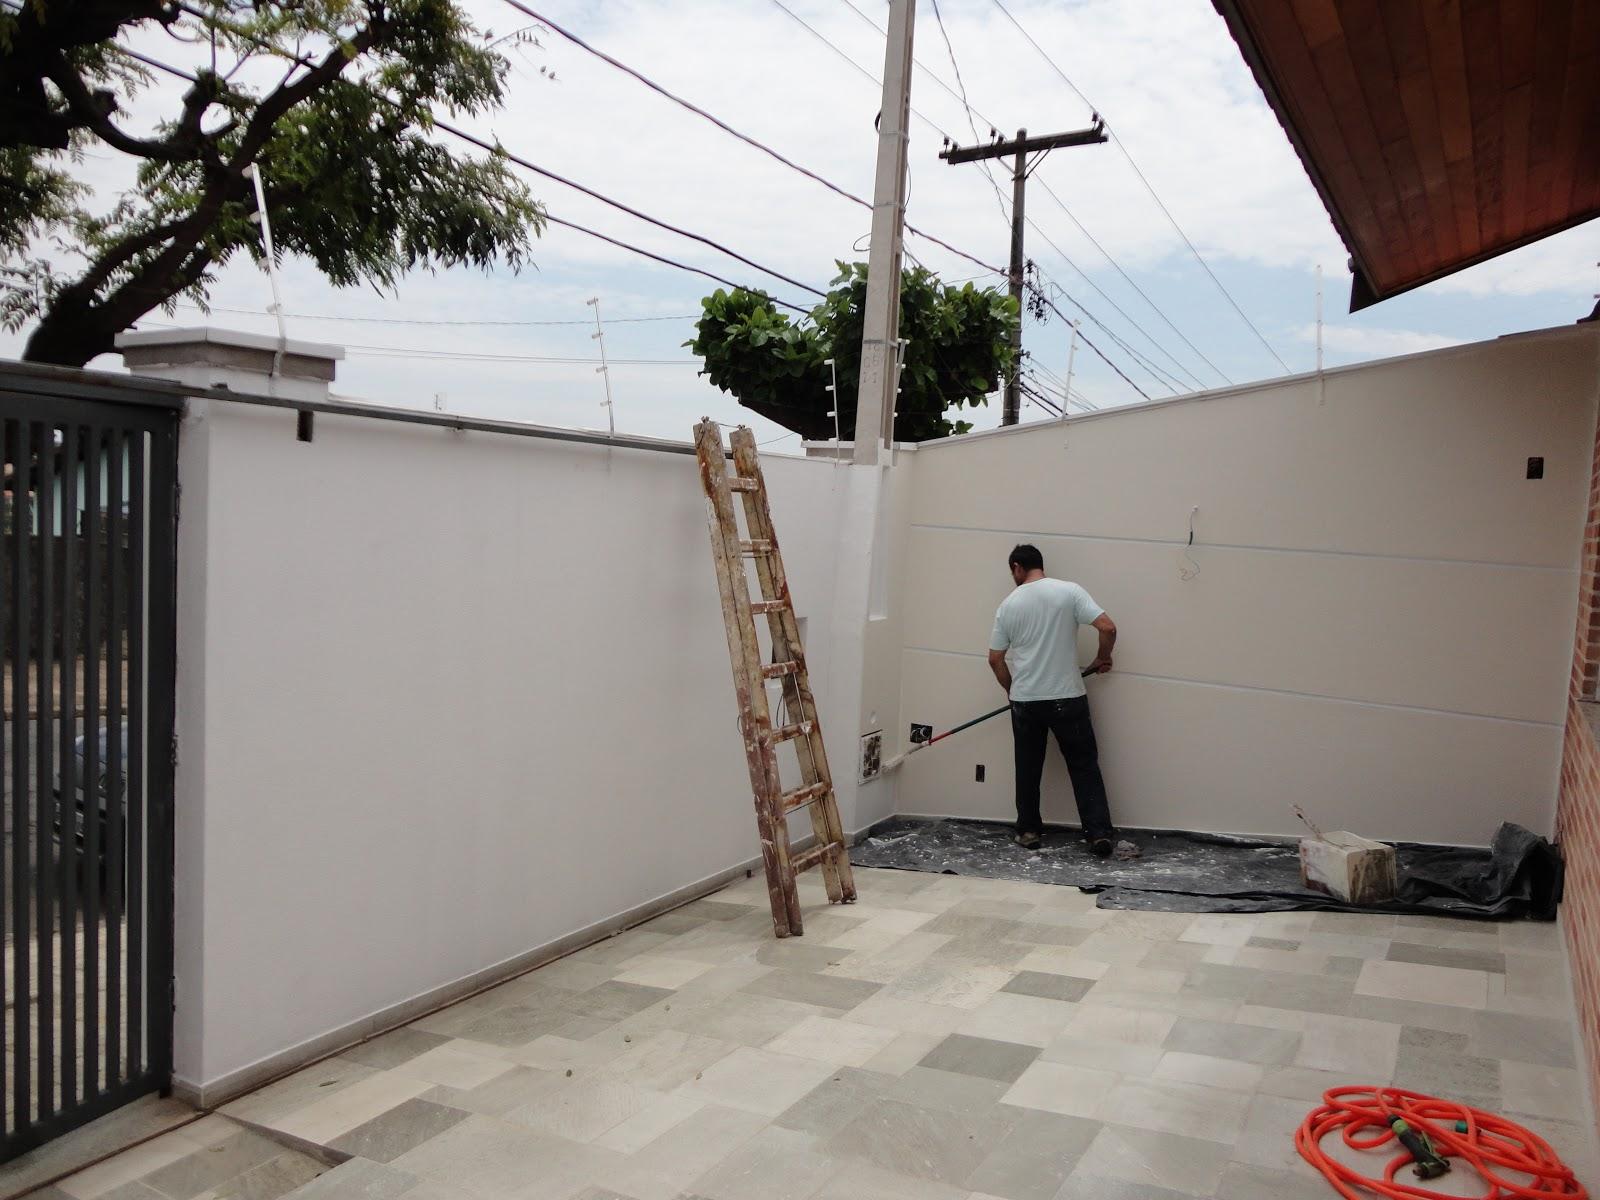 #A72F24 reforma de nossa casa: As cores das tintas deram vida a nova fachada  3538 Arremate Janela Aluminio